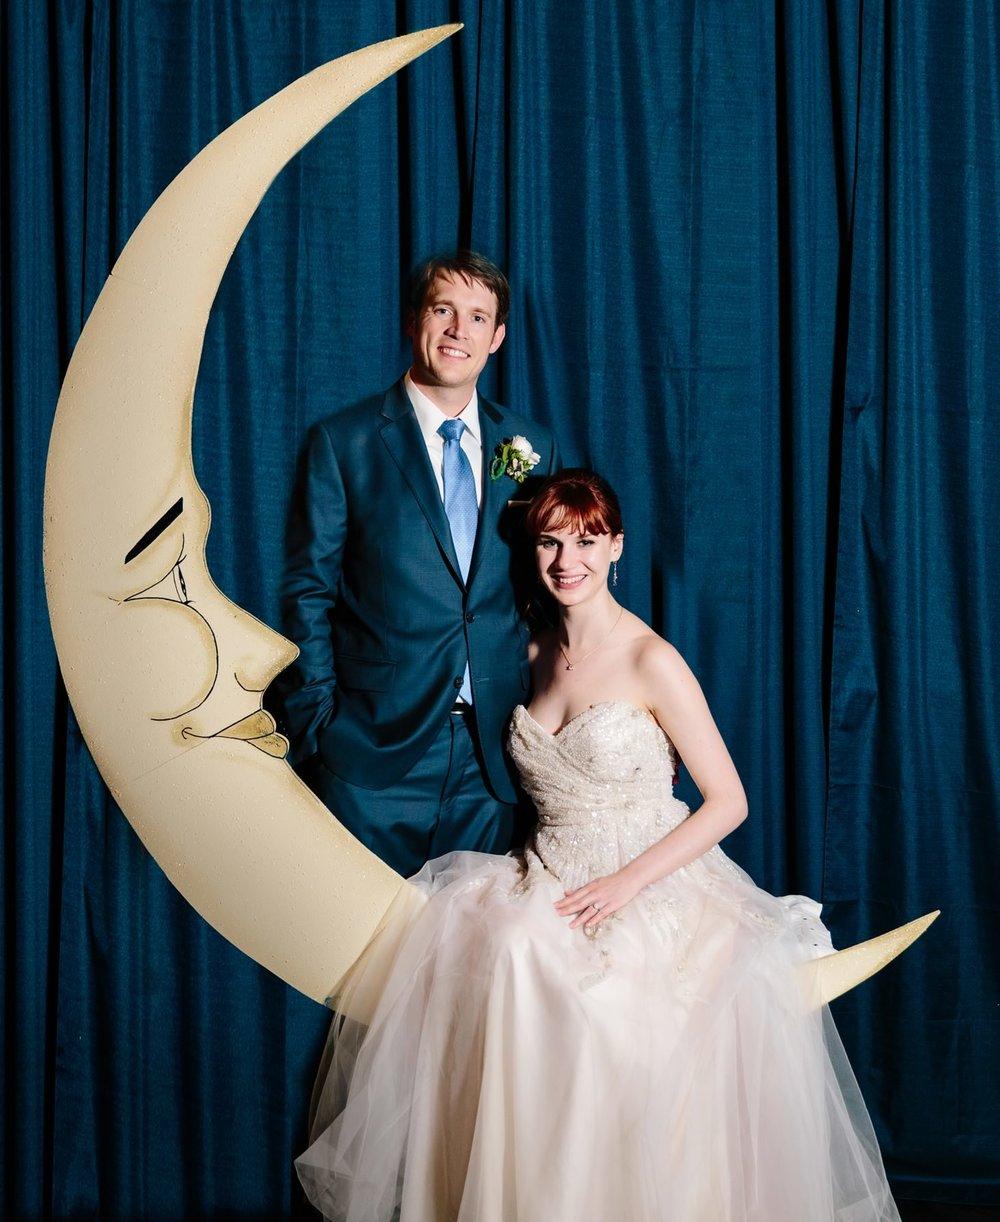 024-nyc-wedding-photographer-smitten-chickens-elope-nyc-wedding-photographer-museum-wedding-smitten-chickens-morris-museum-nj.jpg